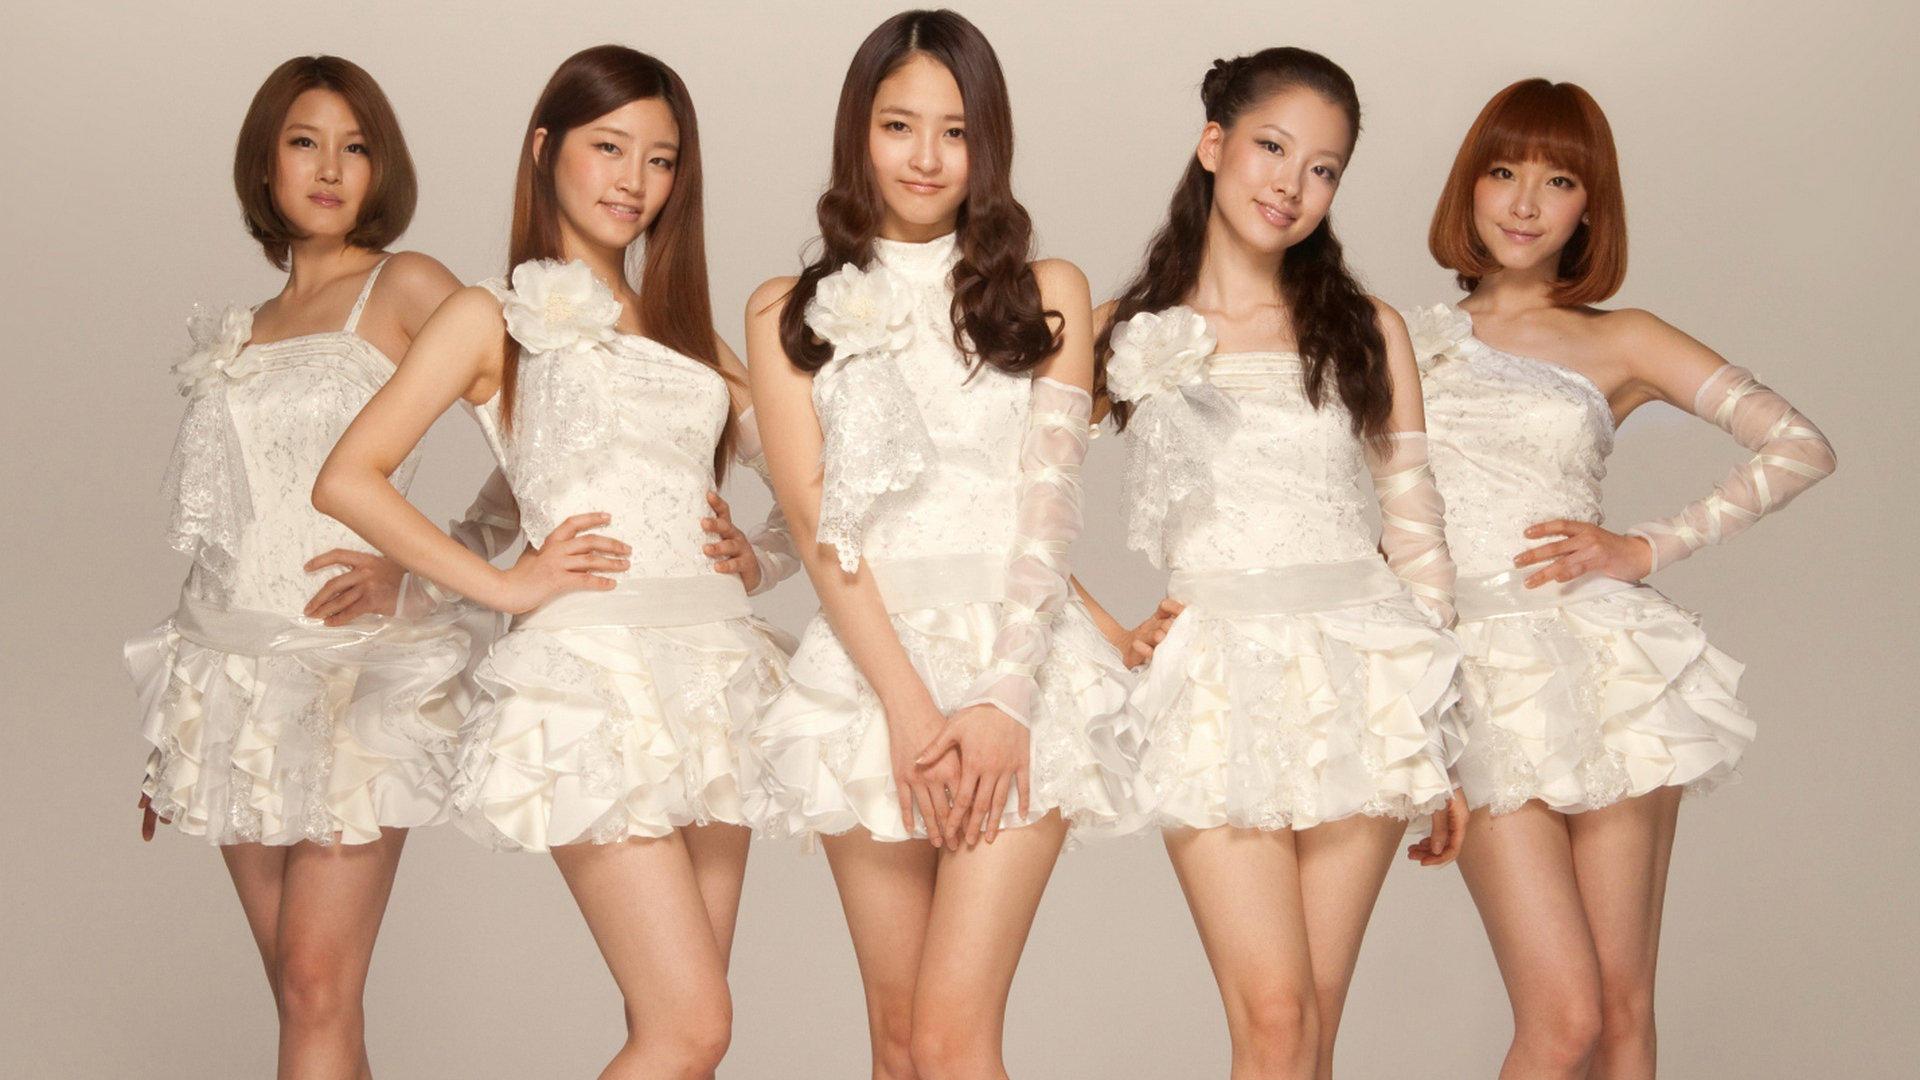 Chi Chi Korea Girl Group Desktop Hd Wallpaper 04 Avance